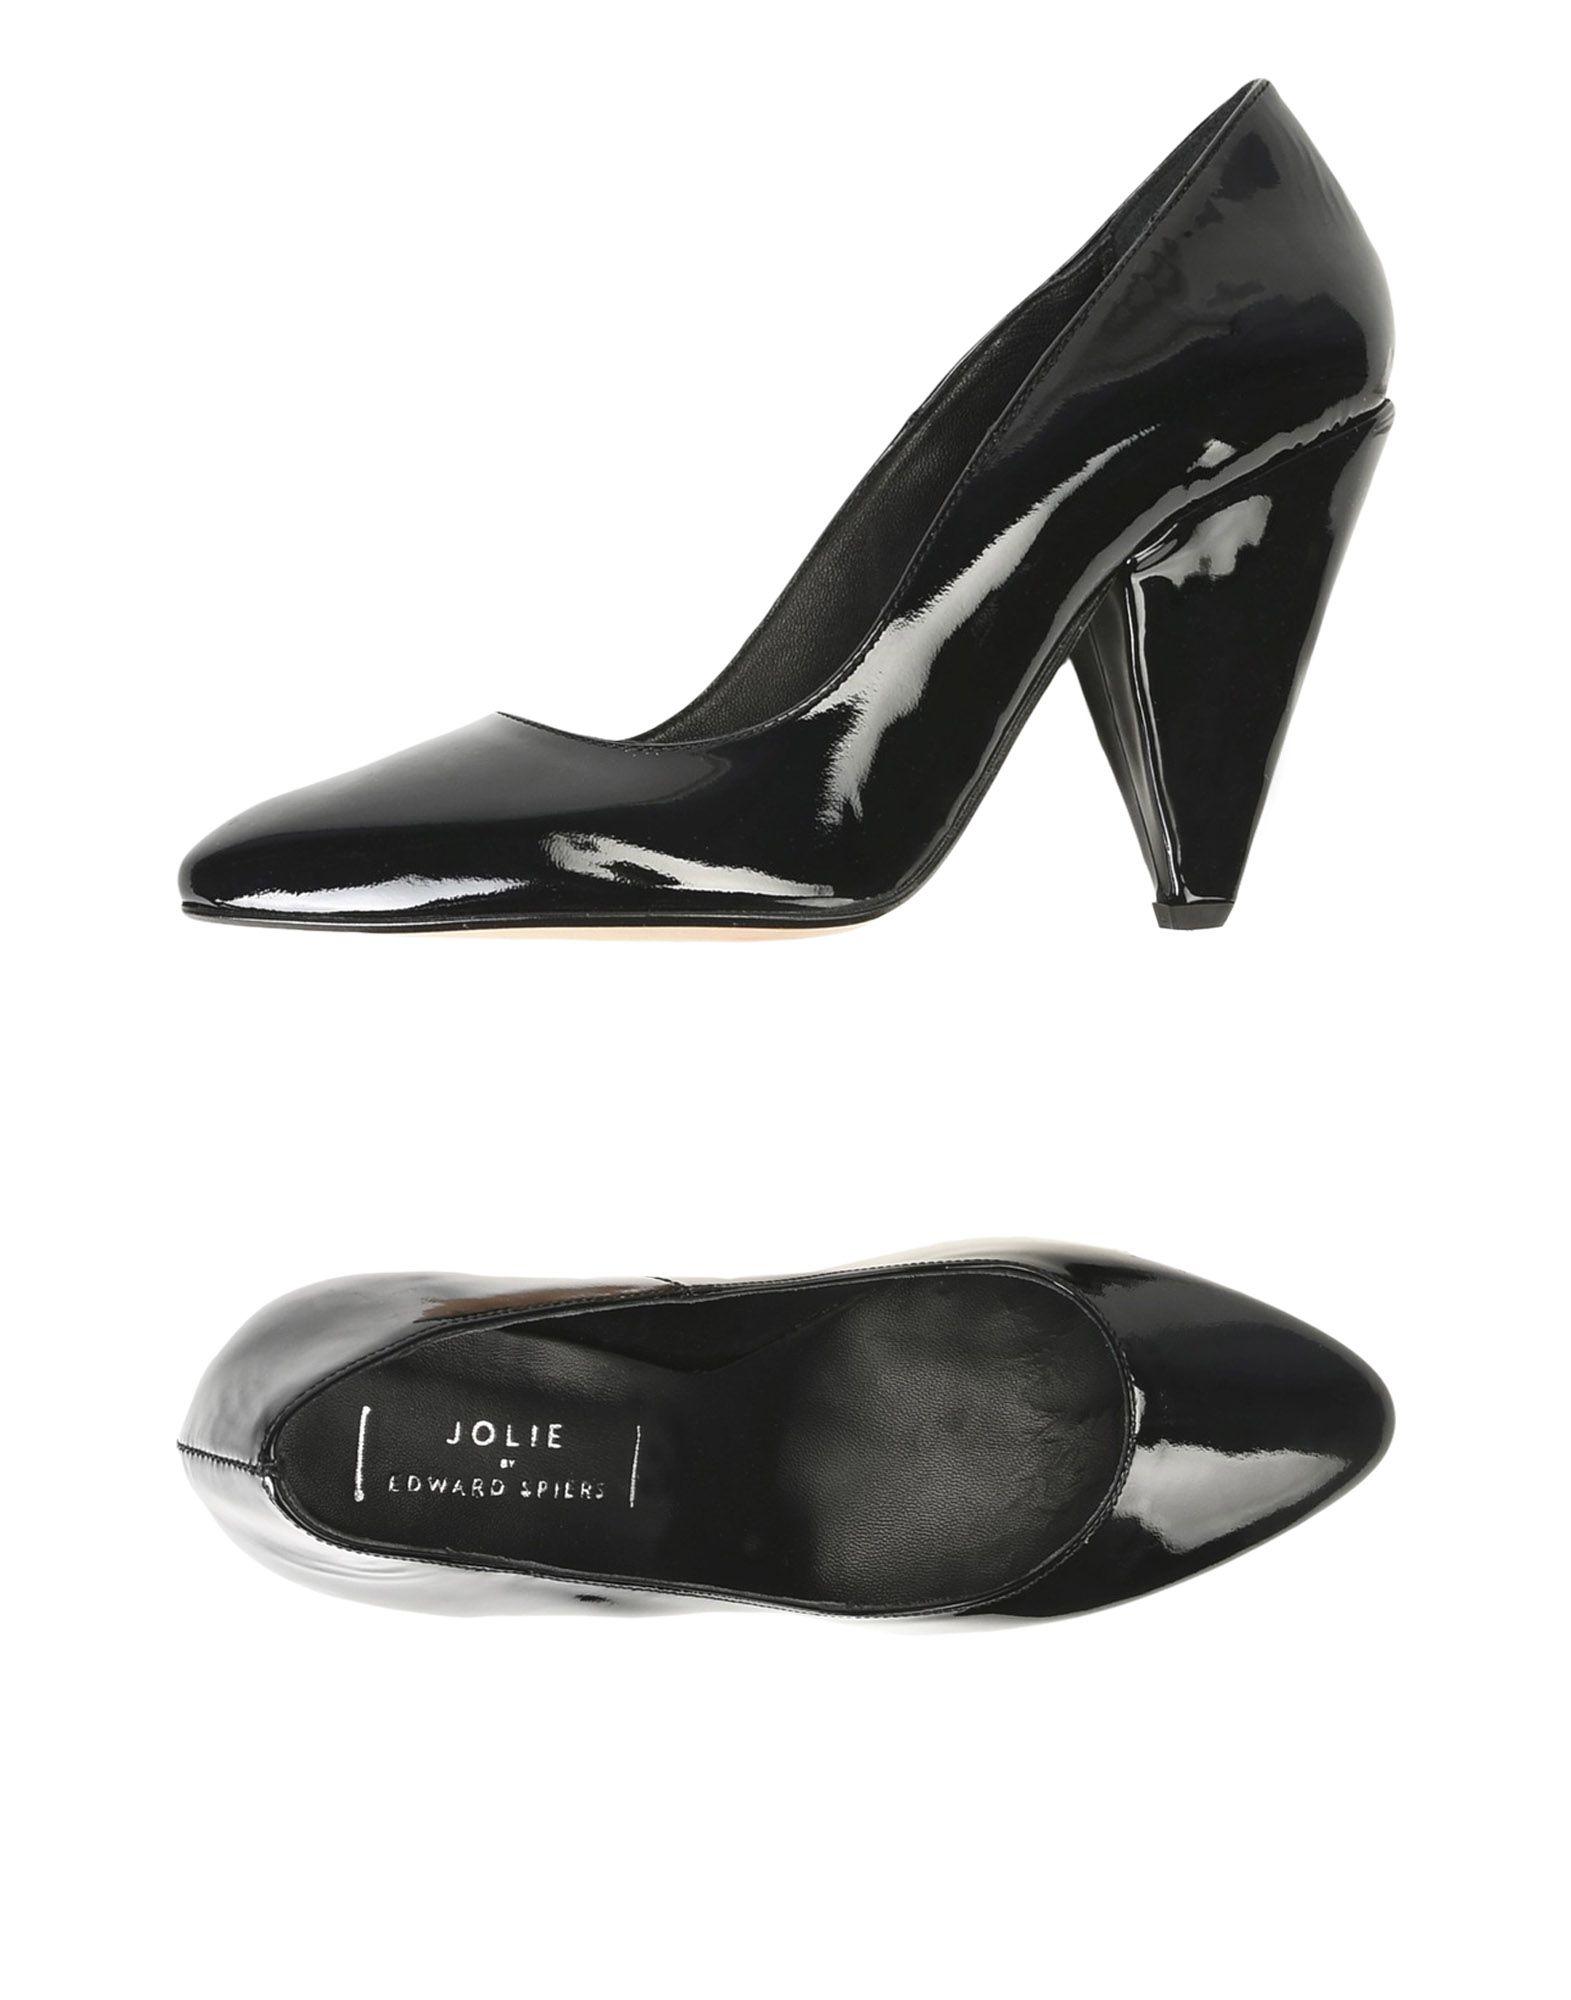 Stilvolle billige Schuhe Jolie By Edward Spiers Pumps Damen  11507869OT